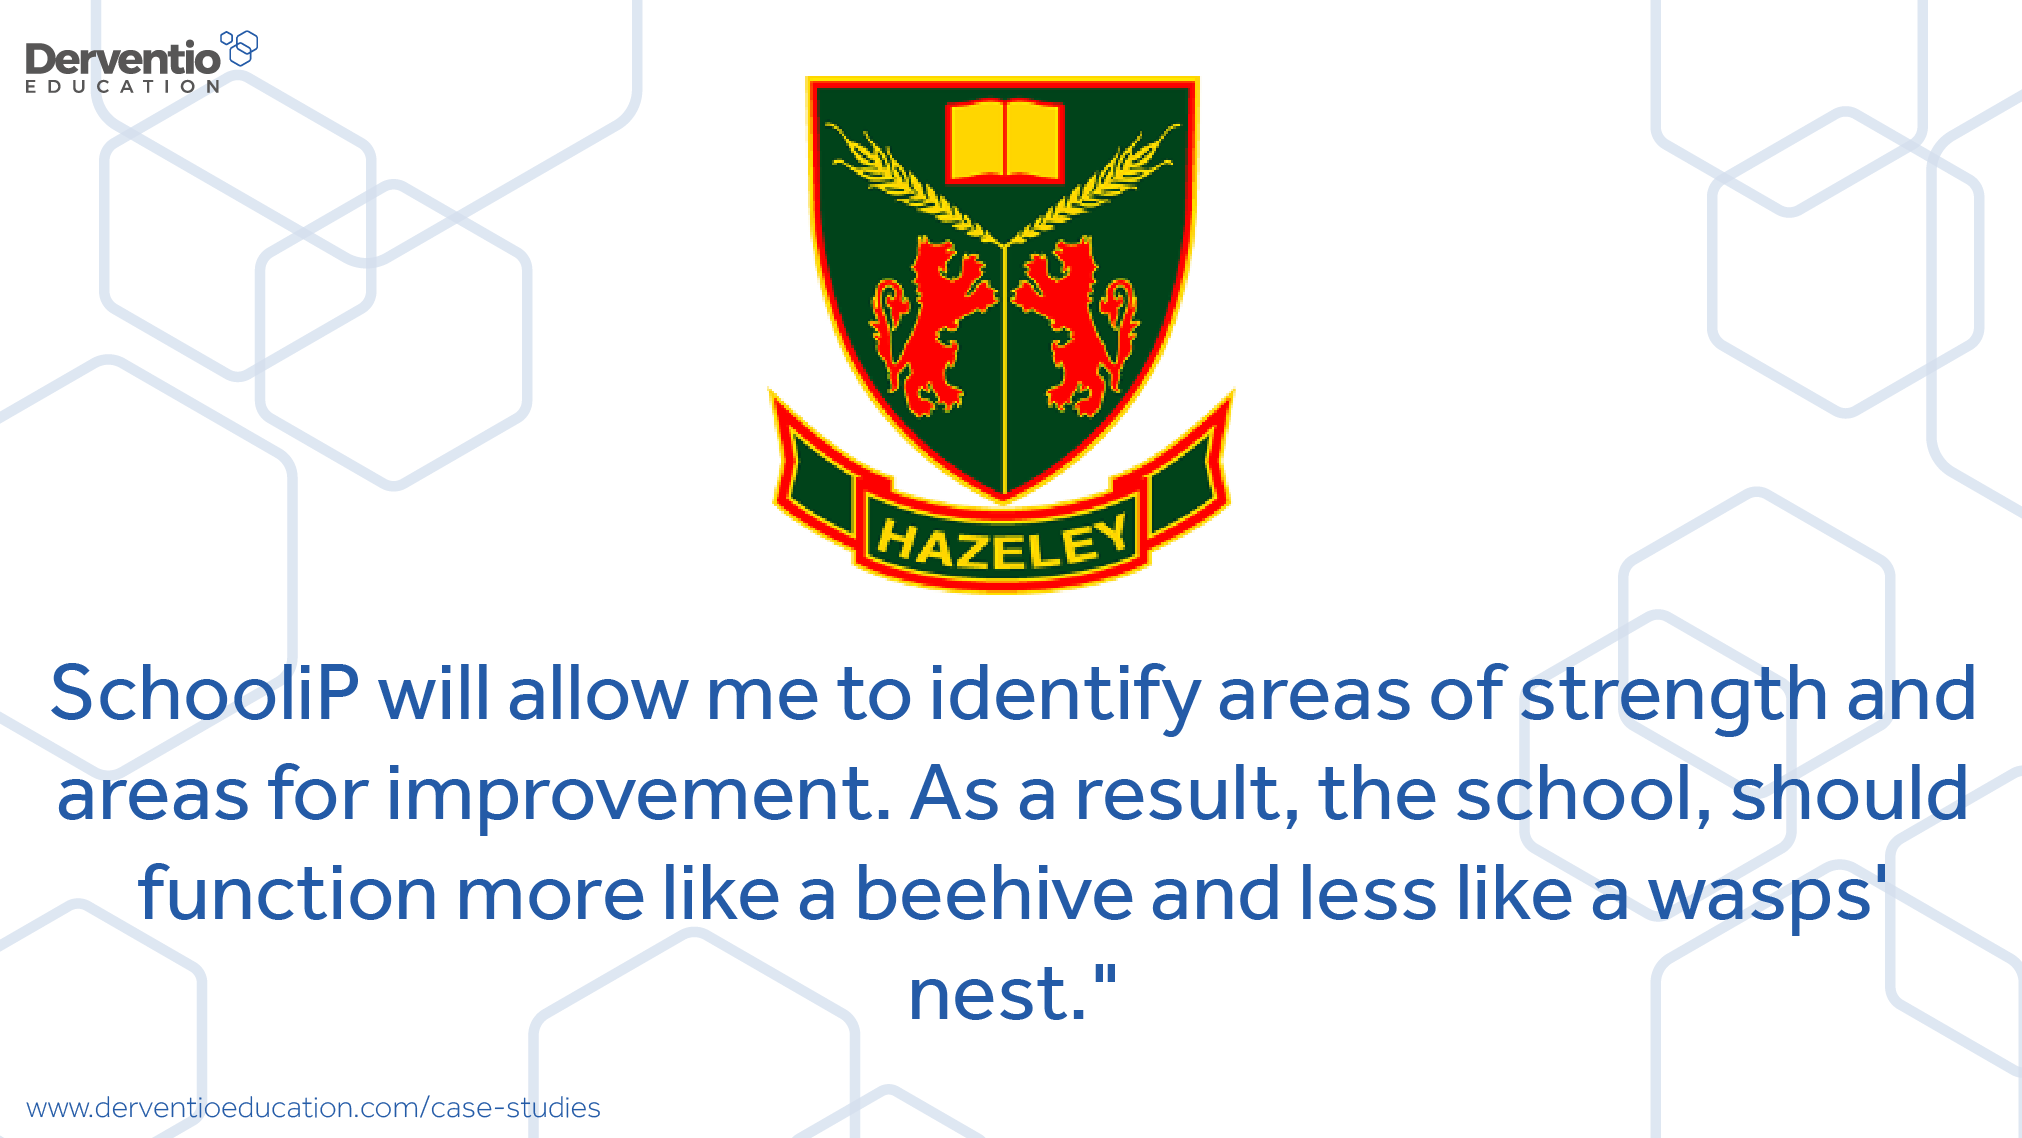 derventio hazeley academy case study hazeley academy